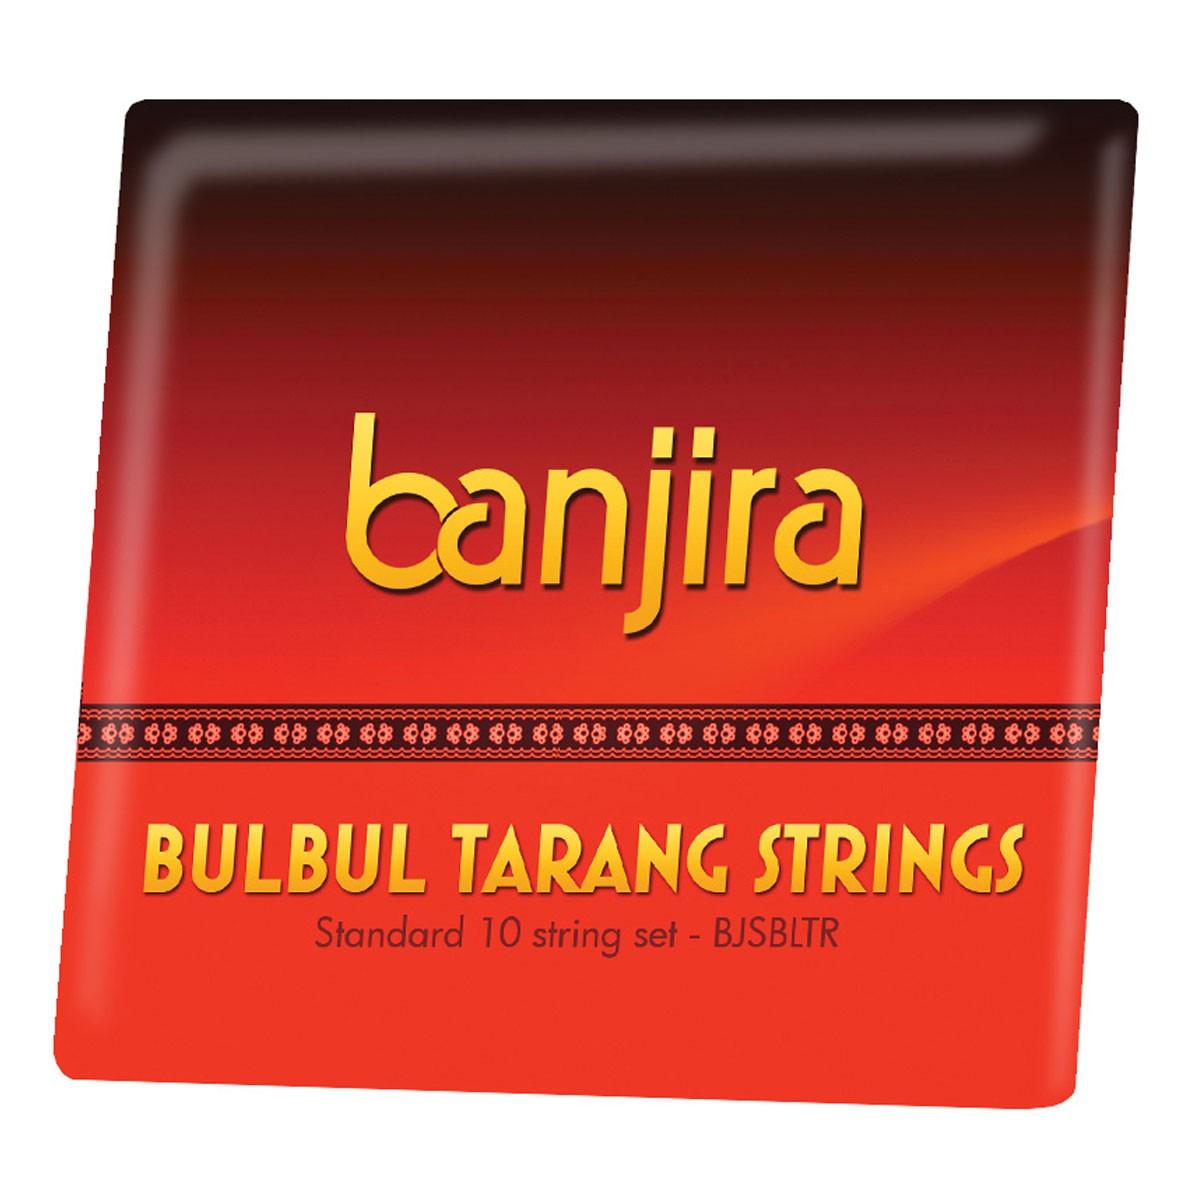 banjira Bulbul Tarang String Set